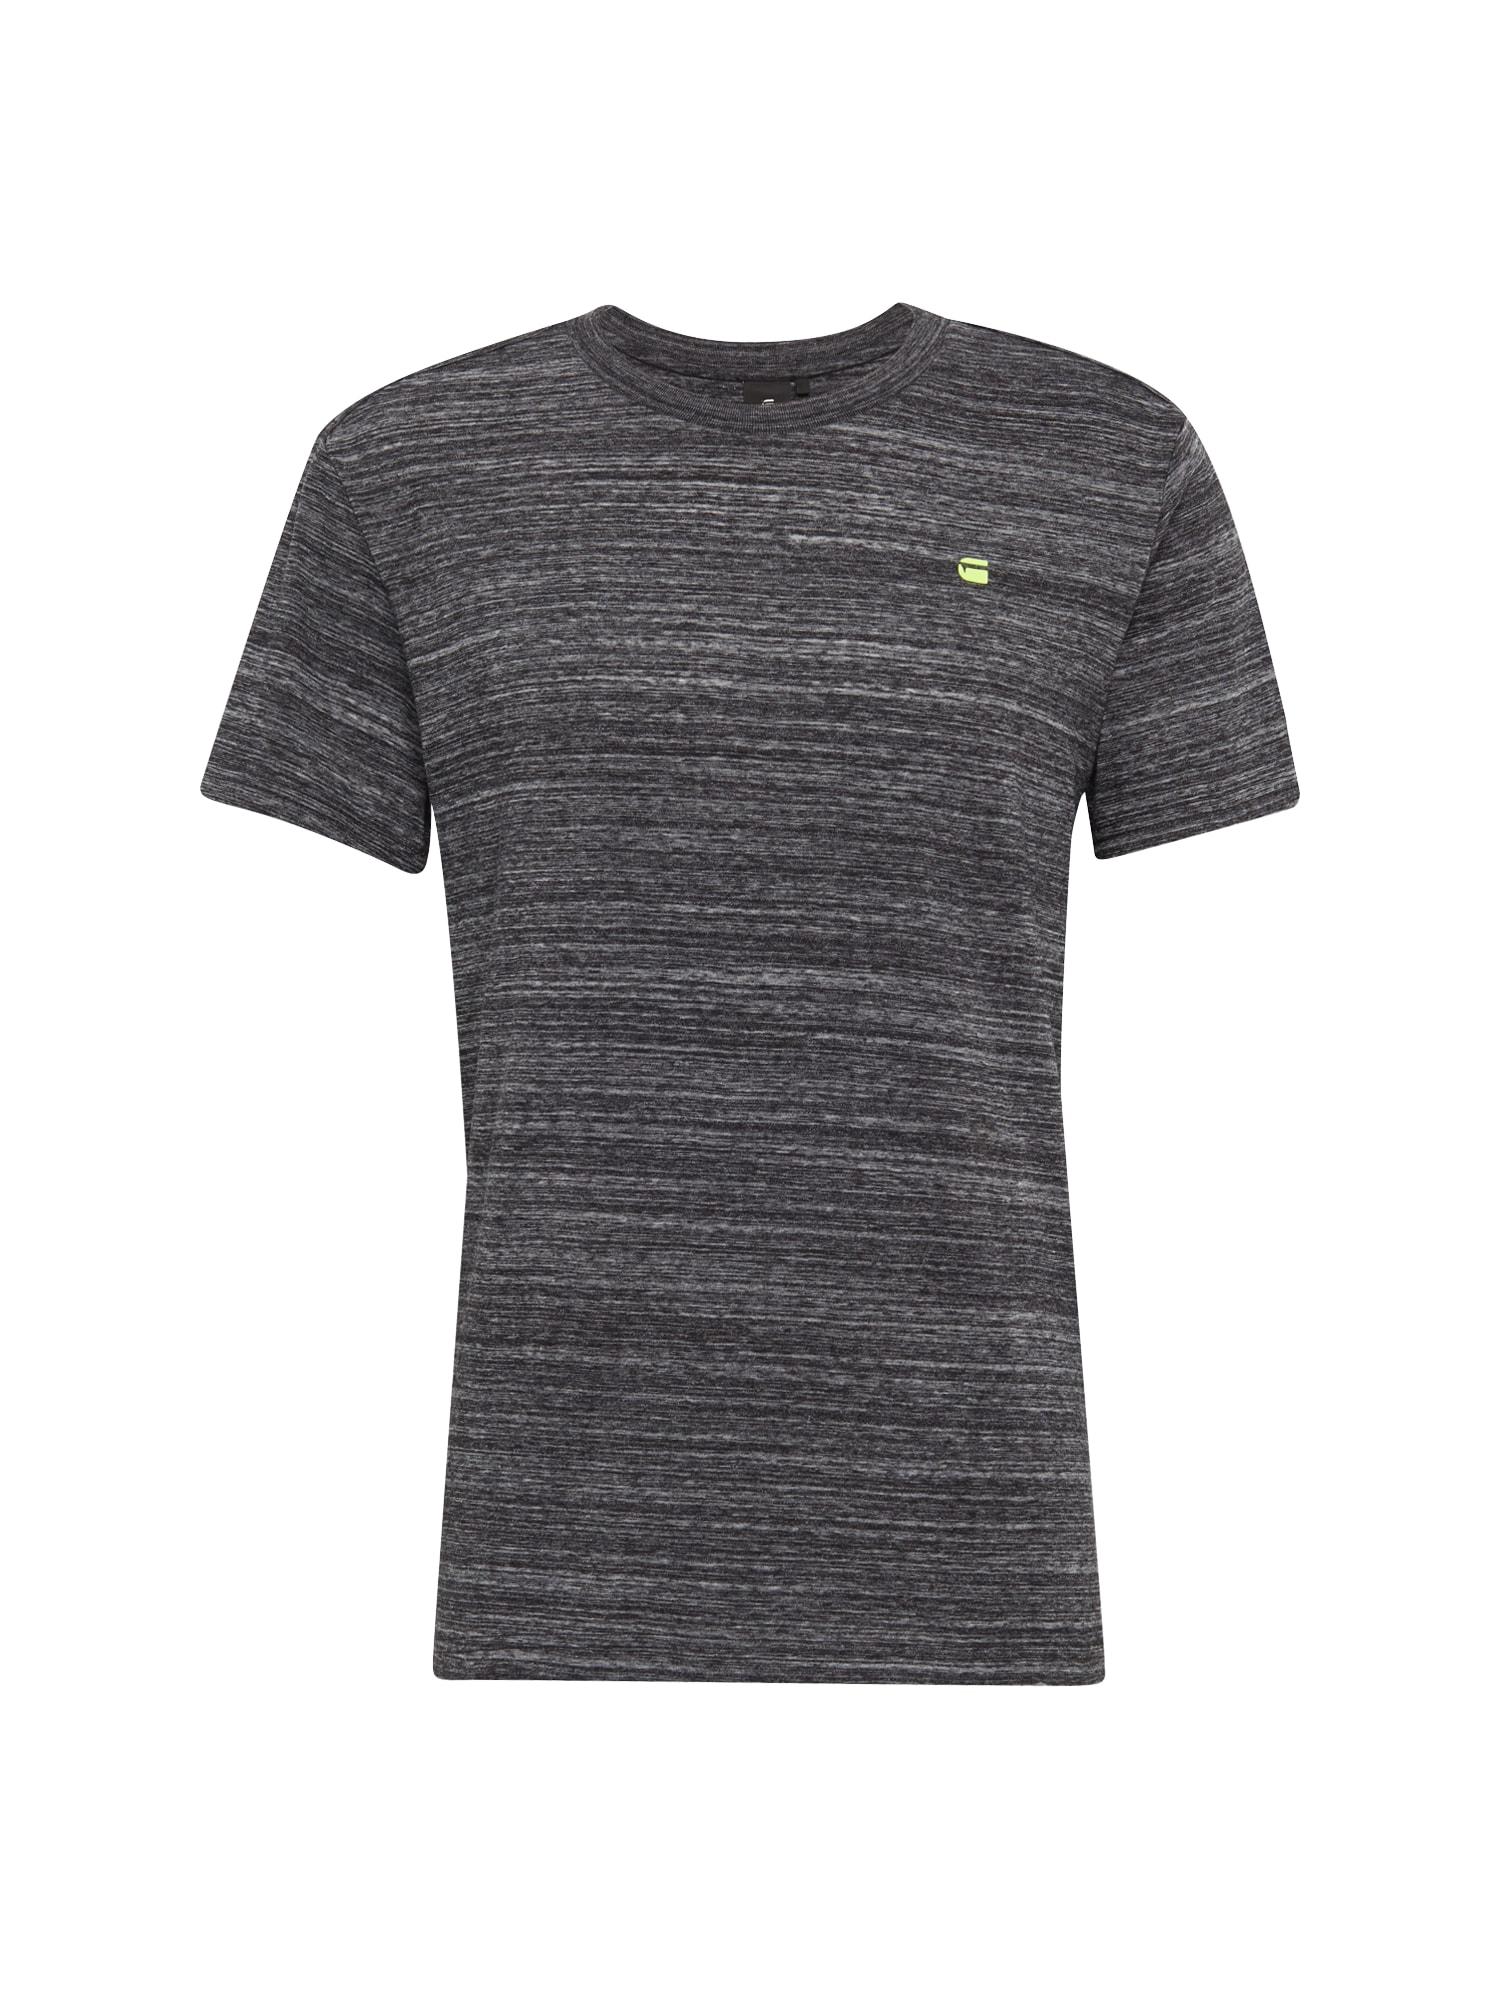 G-STAR RAW Heren Shirt New classic regular r t s s zwart